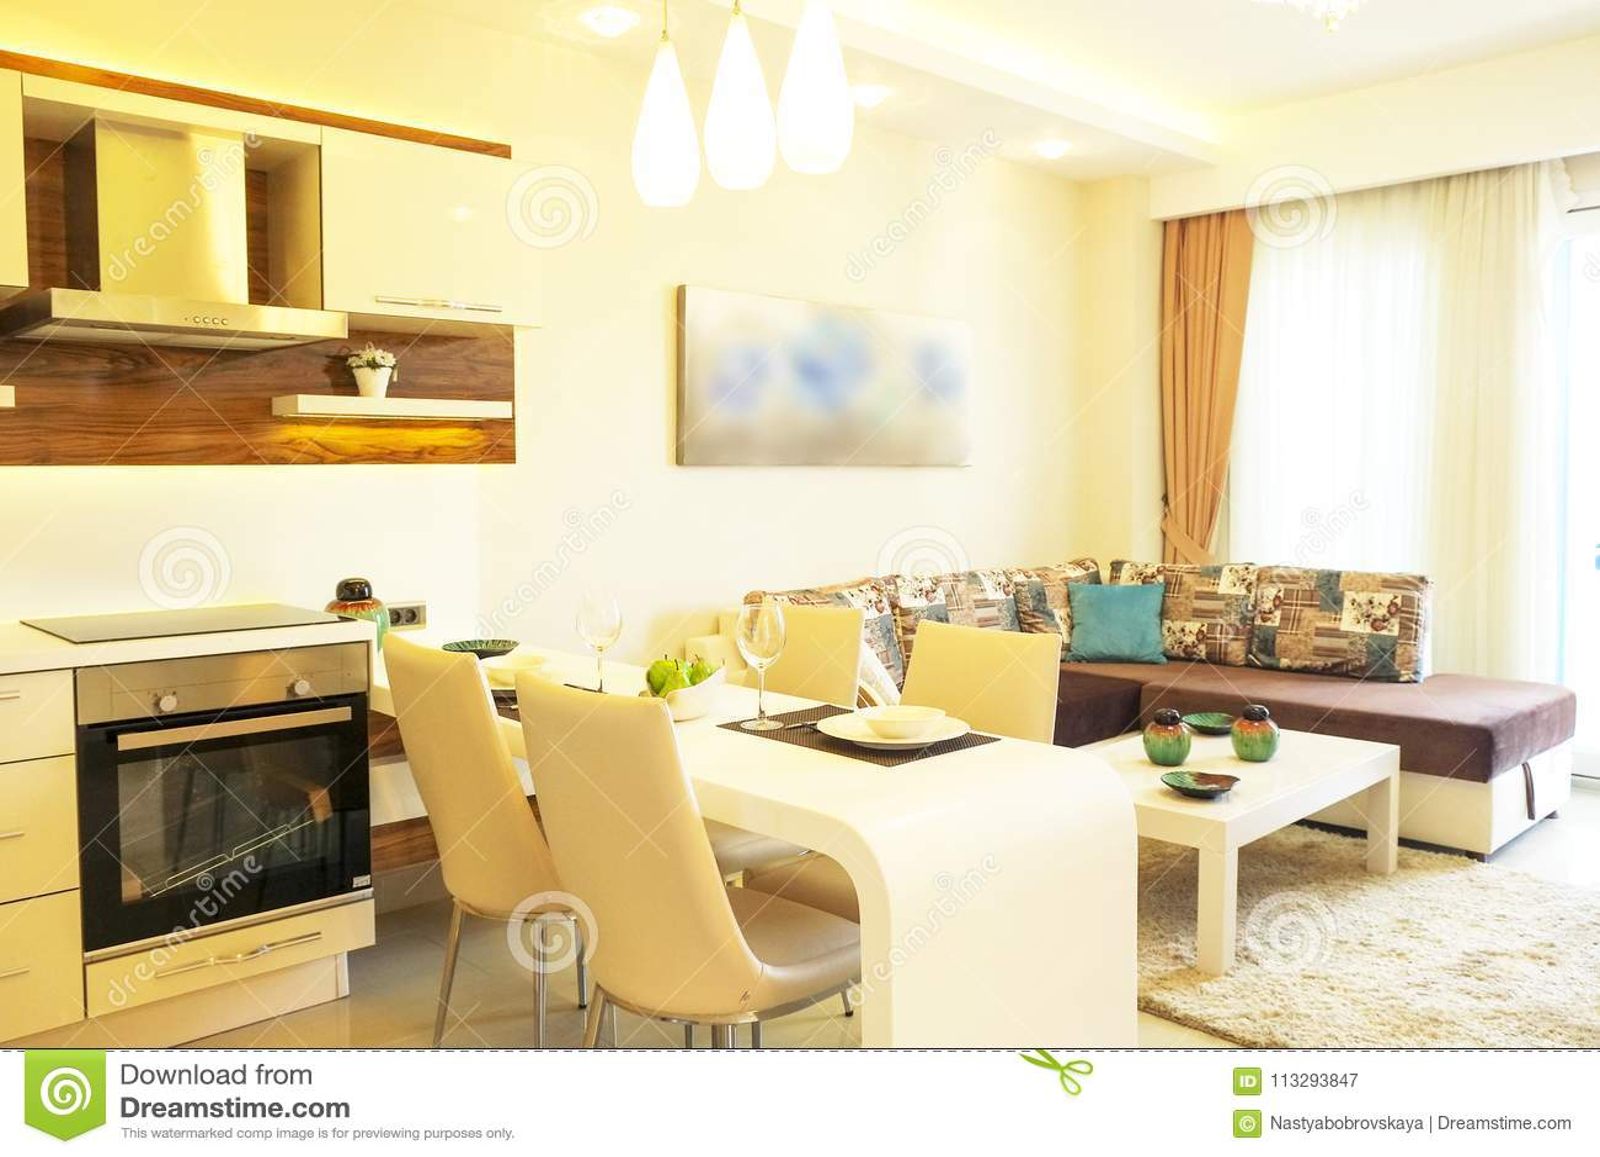 Excepcional Cocina Modular Diseña Precio Chennai Festooning - Ideas ...